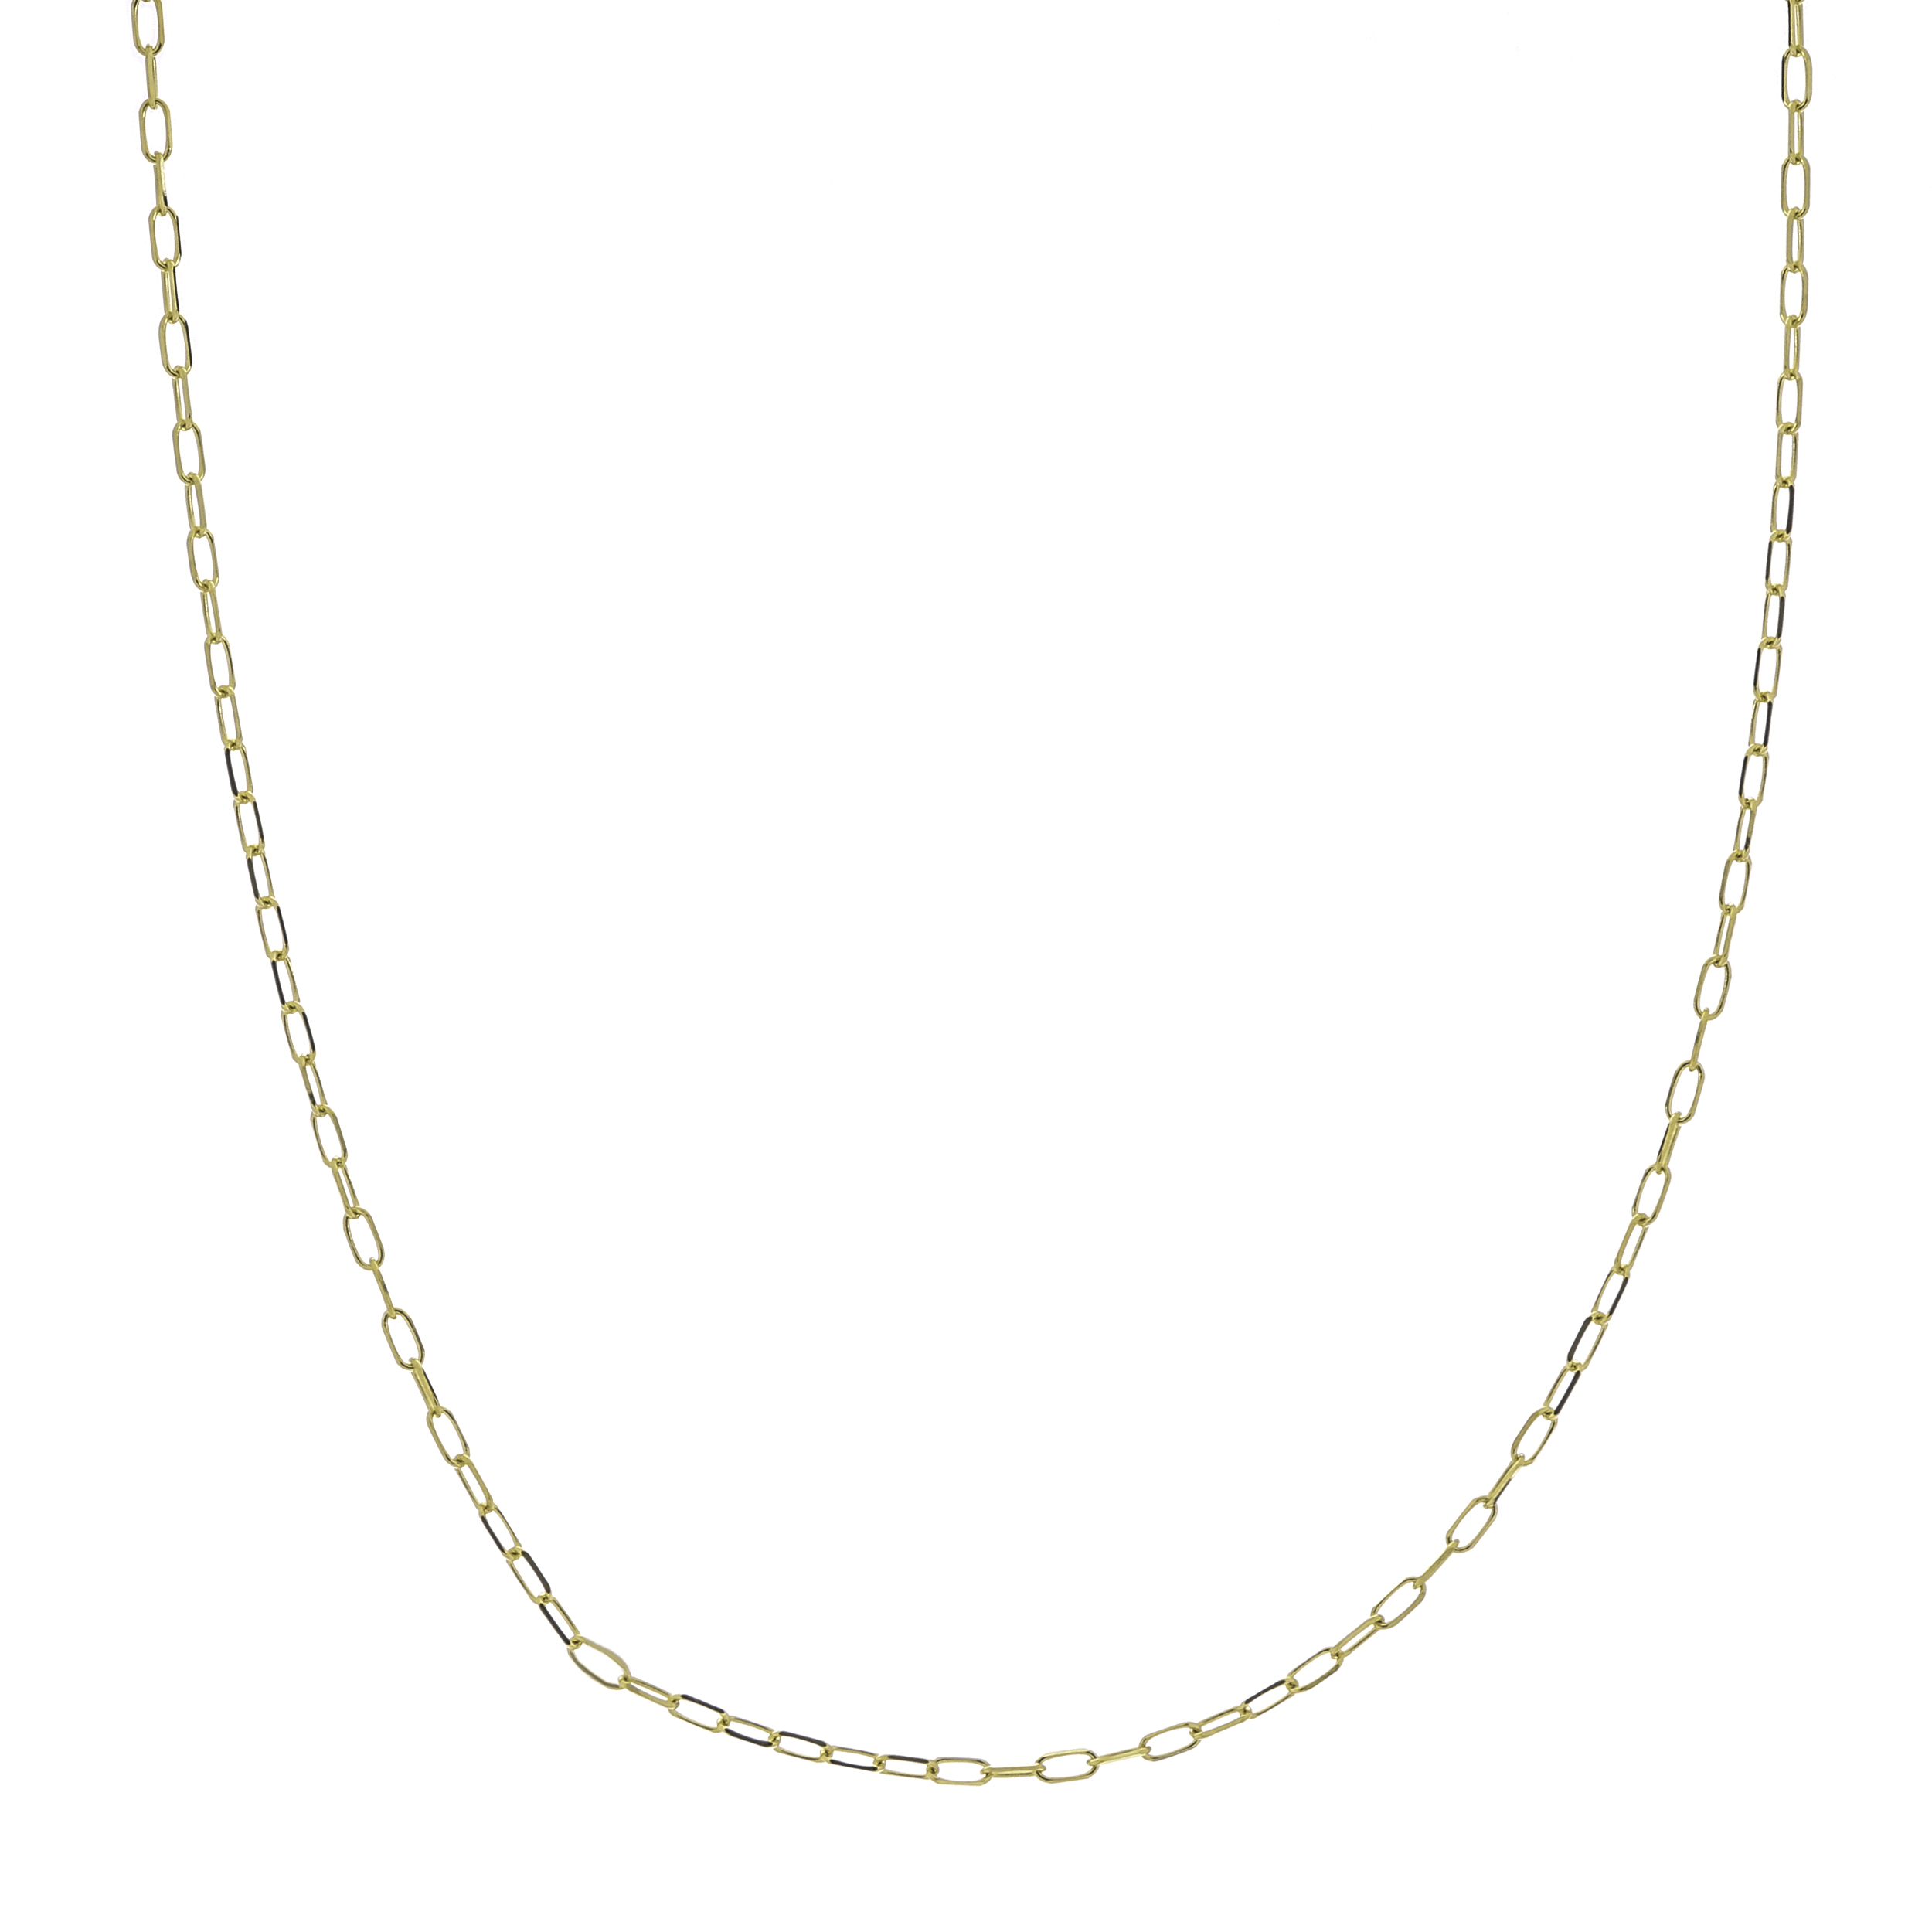 Forzentina Chain, 14Kt Gold  Diamond Cut Forzentina Chain / 24